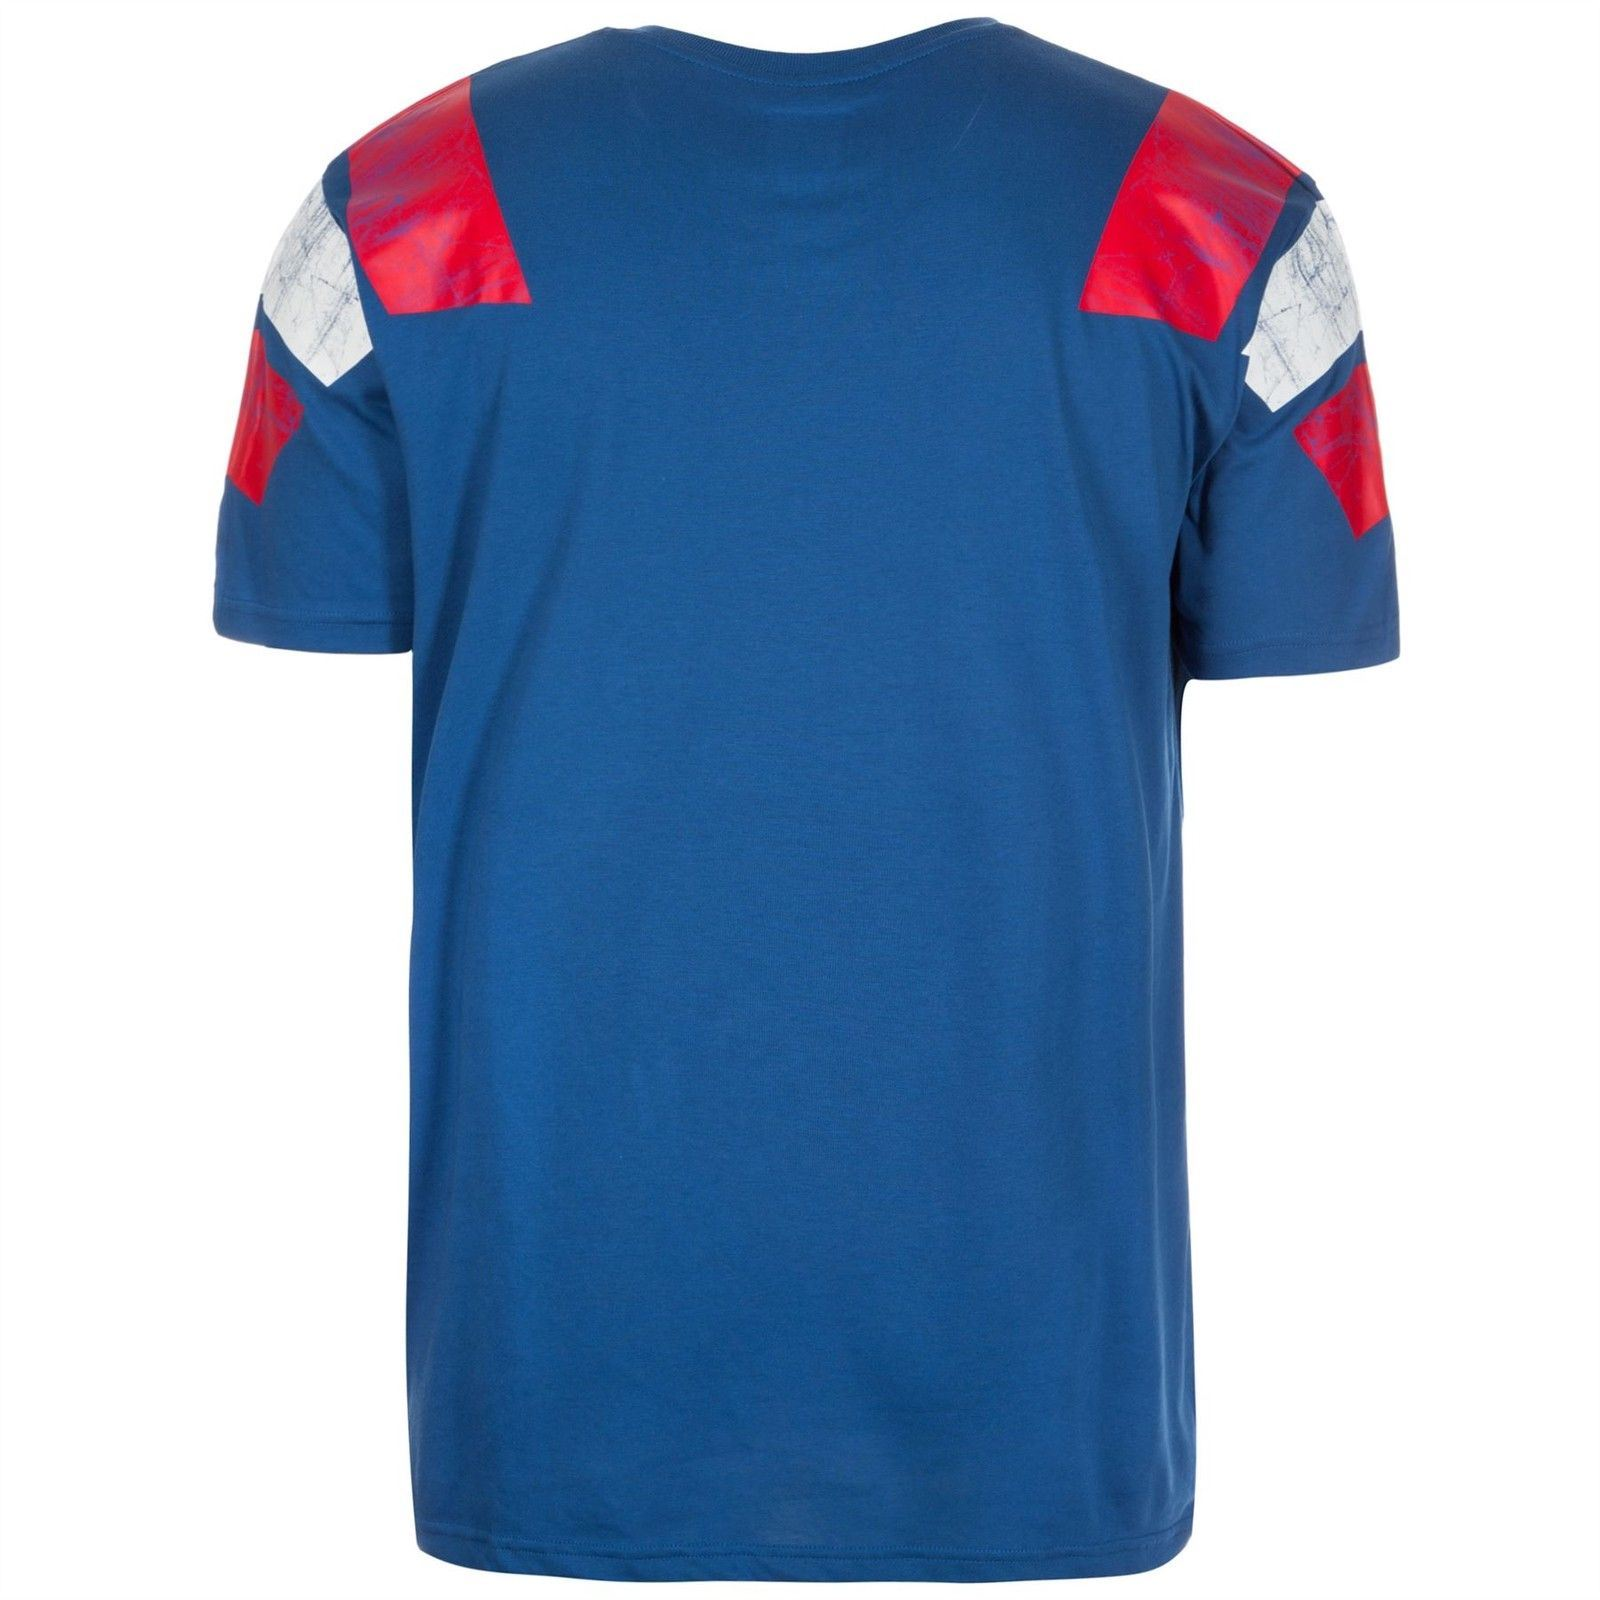 fb2702bfd adidas ORIGINALS RETRO FOOTBALL JERSEYS FRANCE GERMANY SPAIN REAL ...